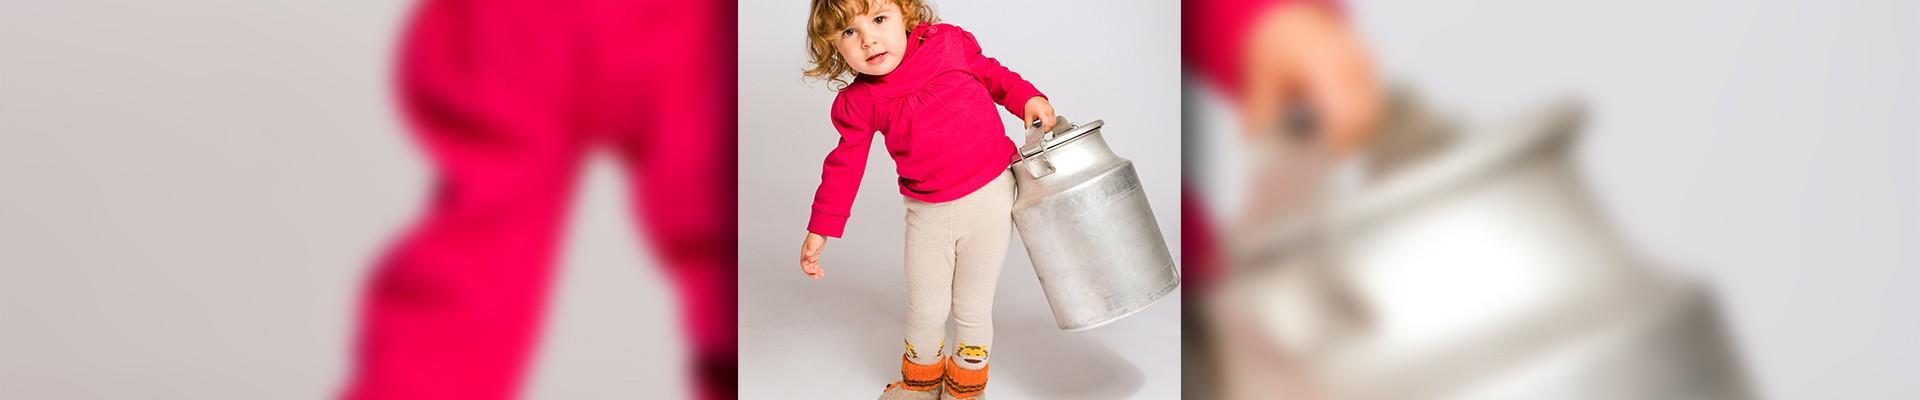 little girl lifting a milk jug